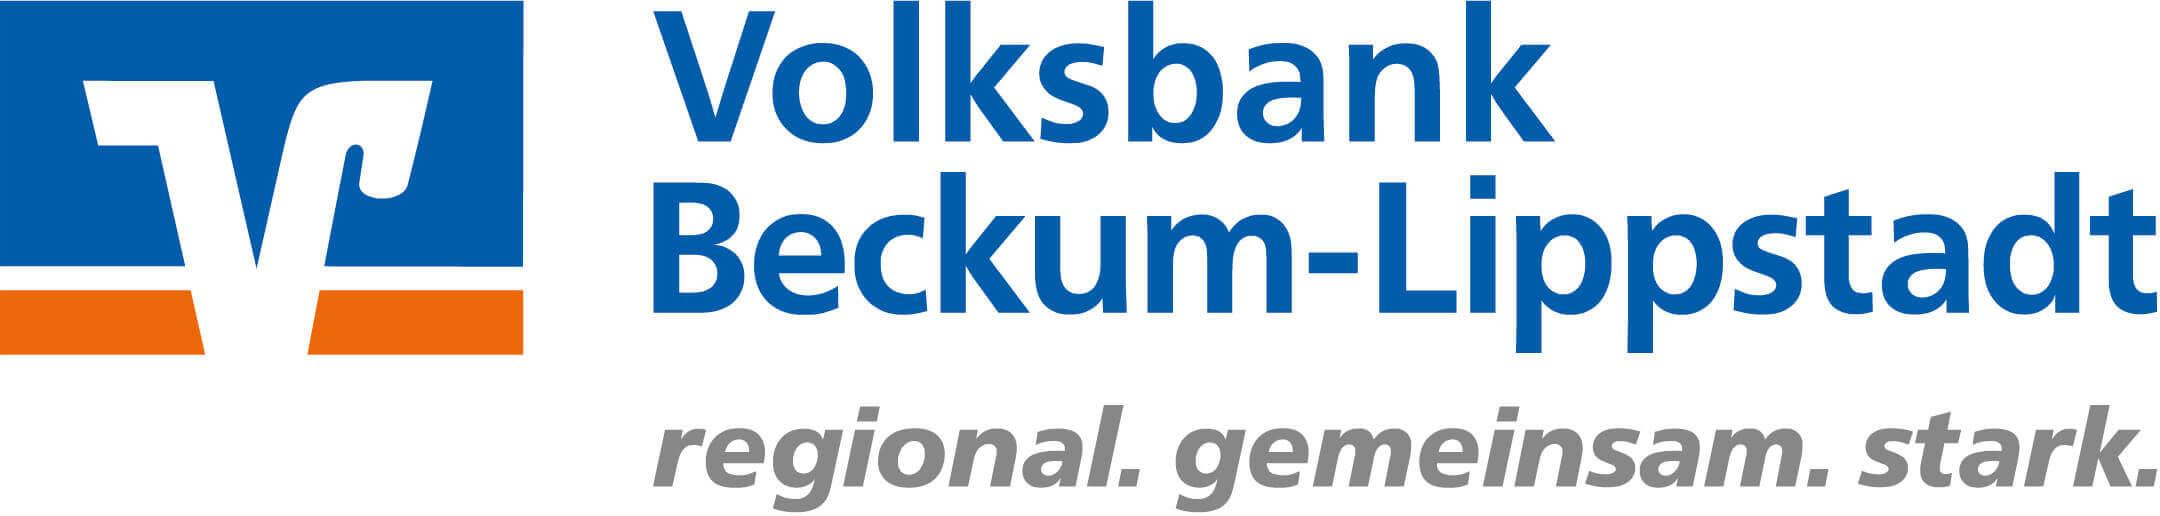 Volksbank-Blog